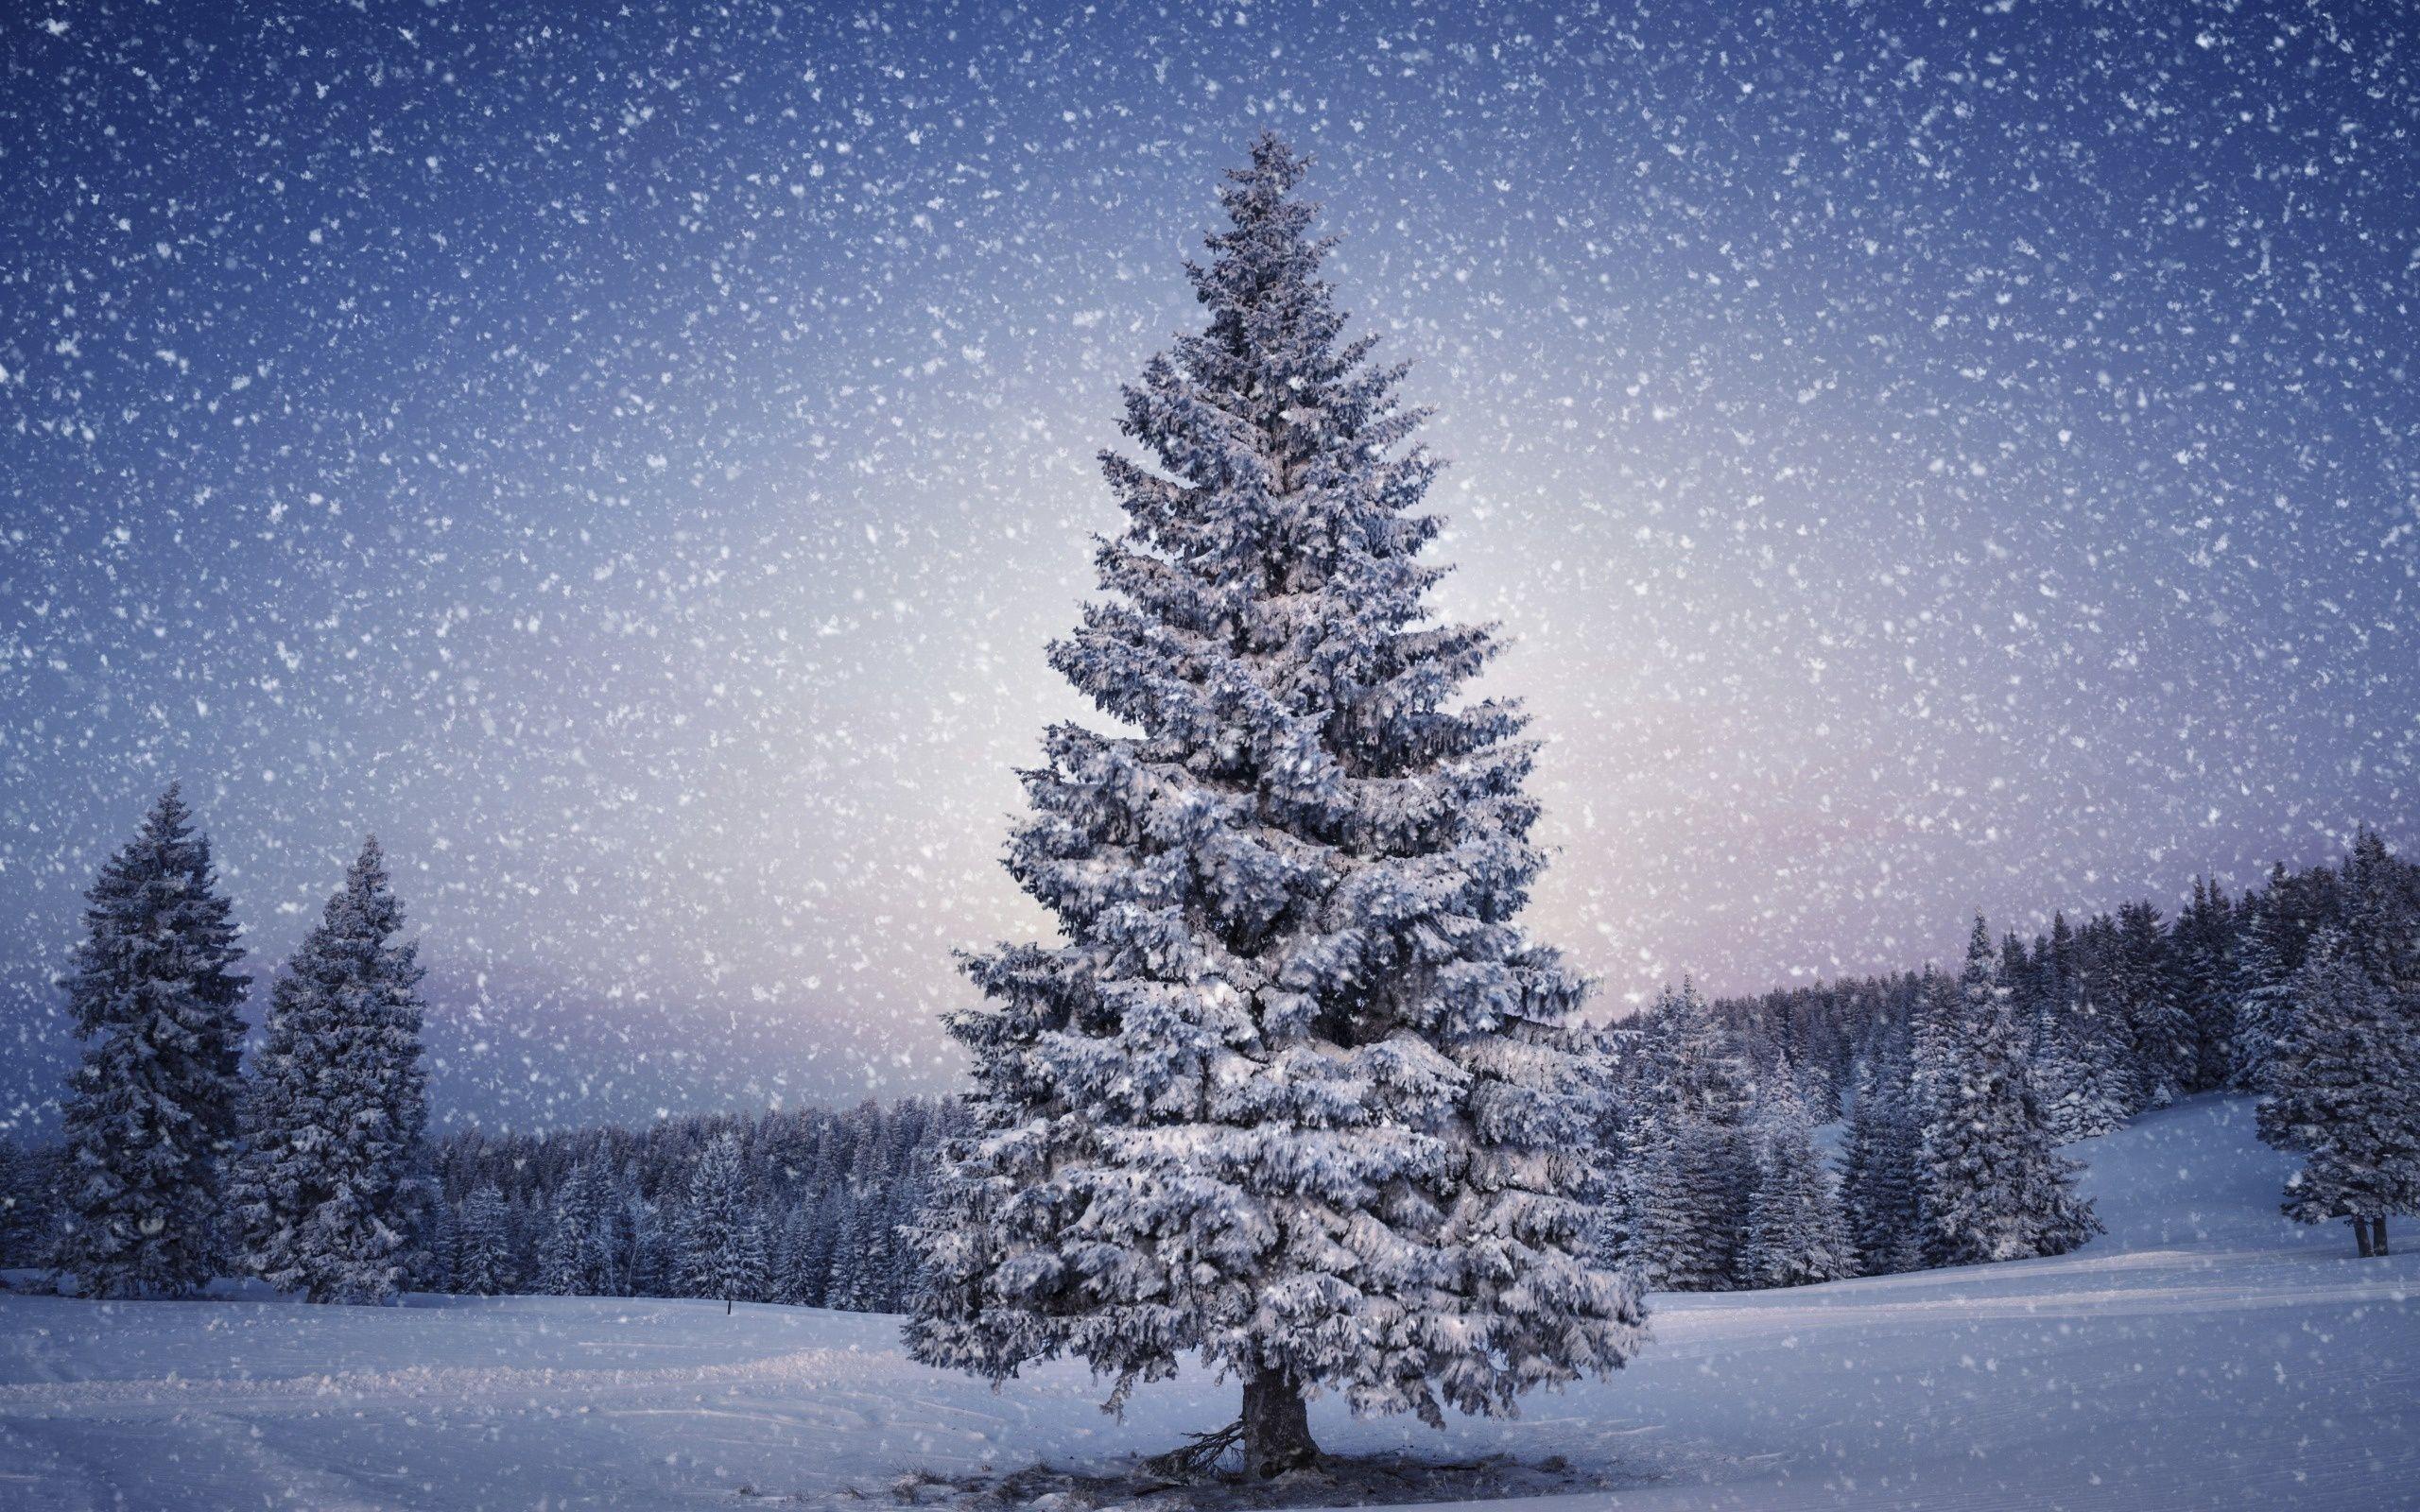 Snowy Trees Wallpaper